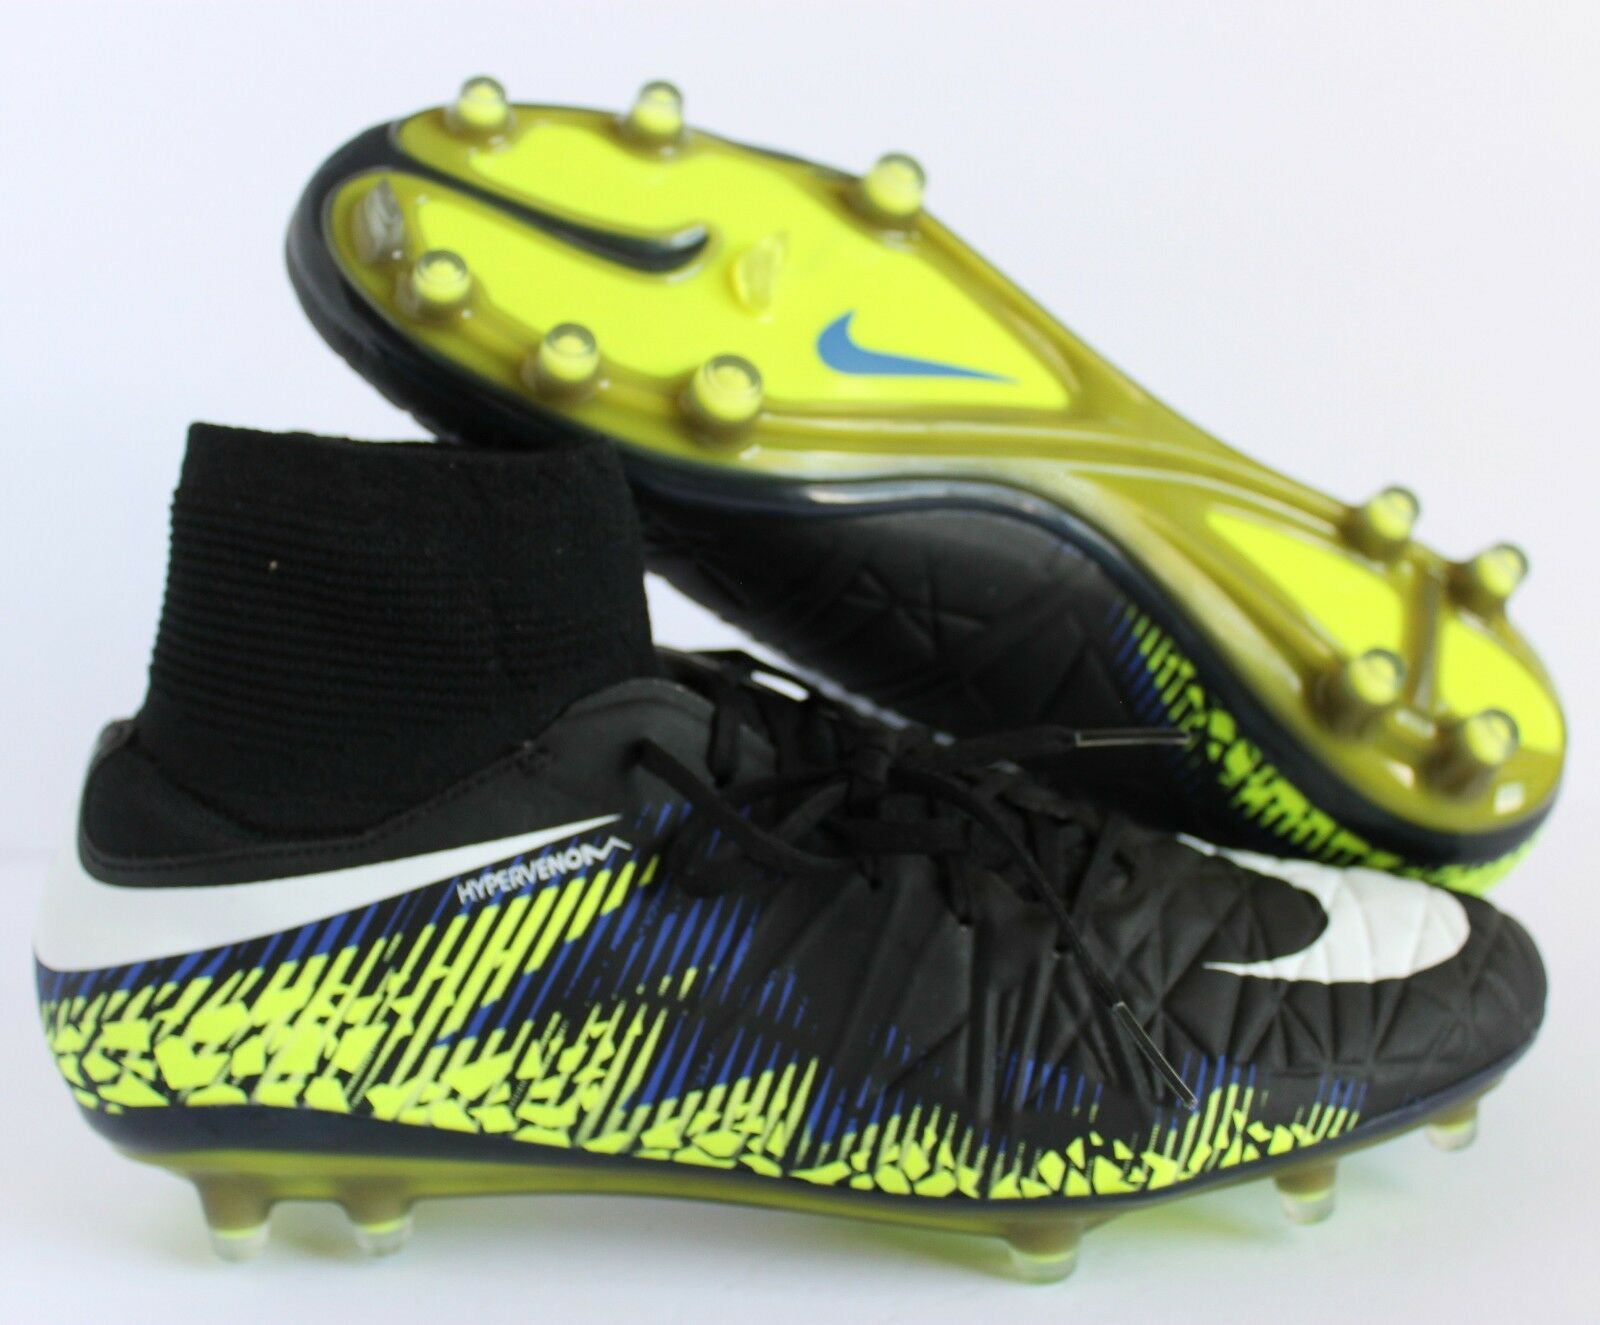 Nike hypervenom phatal ii - fg schwarz-Weiß-volt sz 9,5 9,5 9,5 2c202f